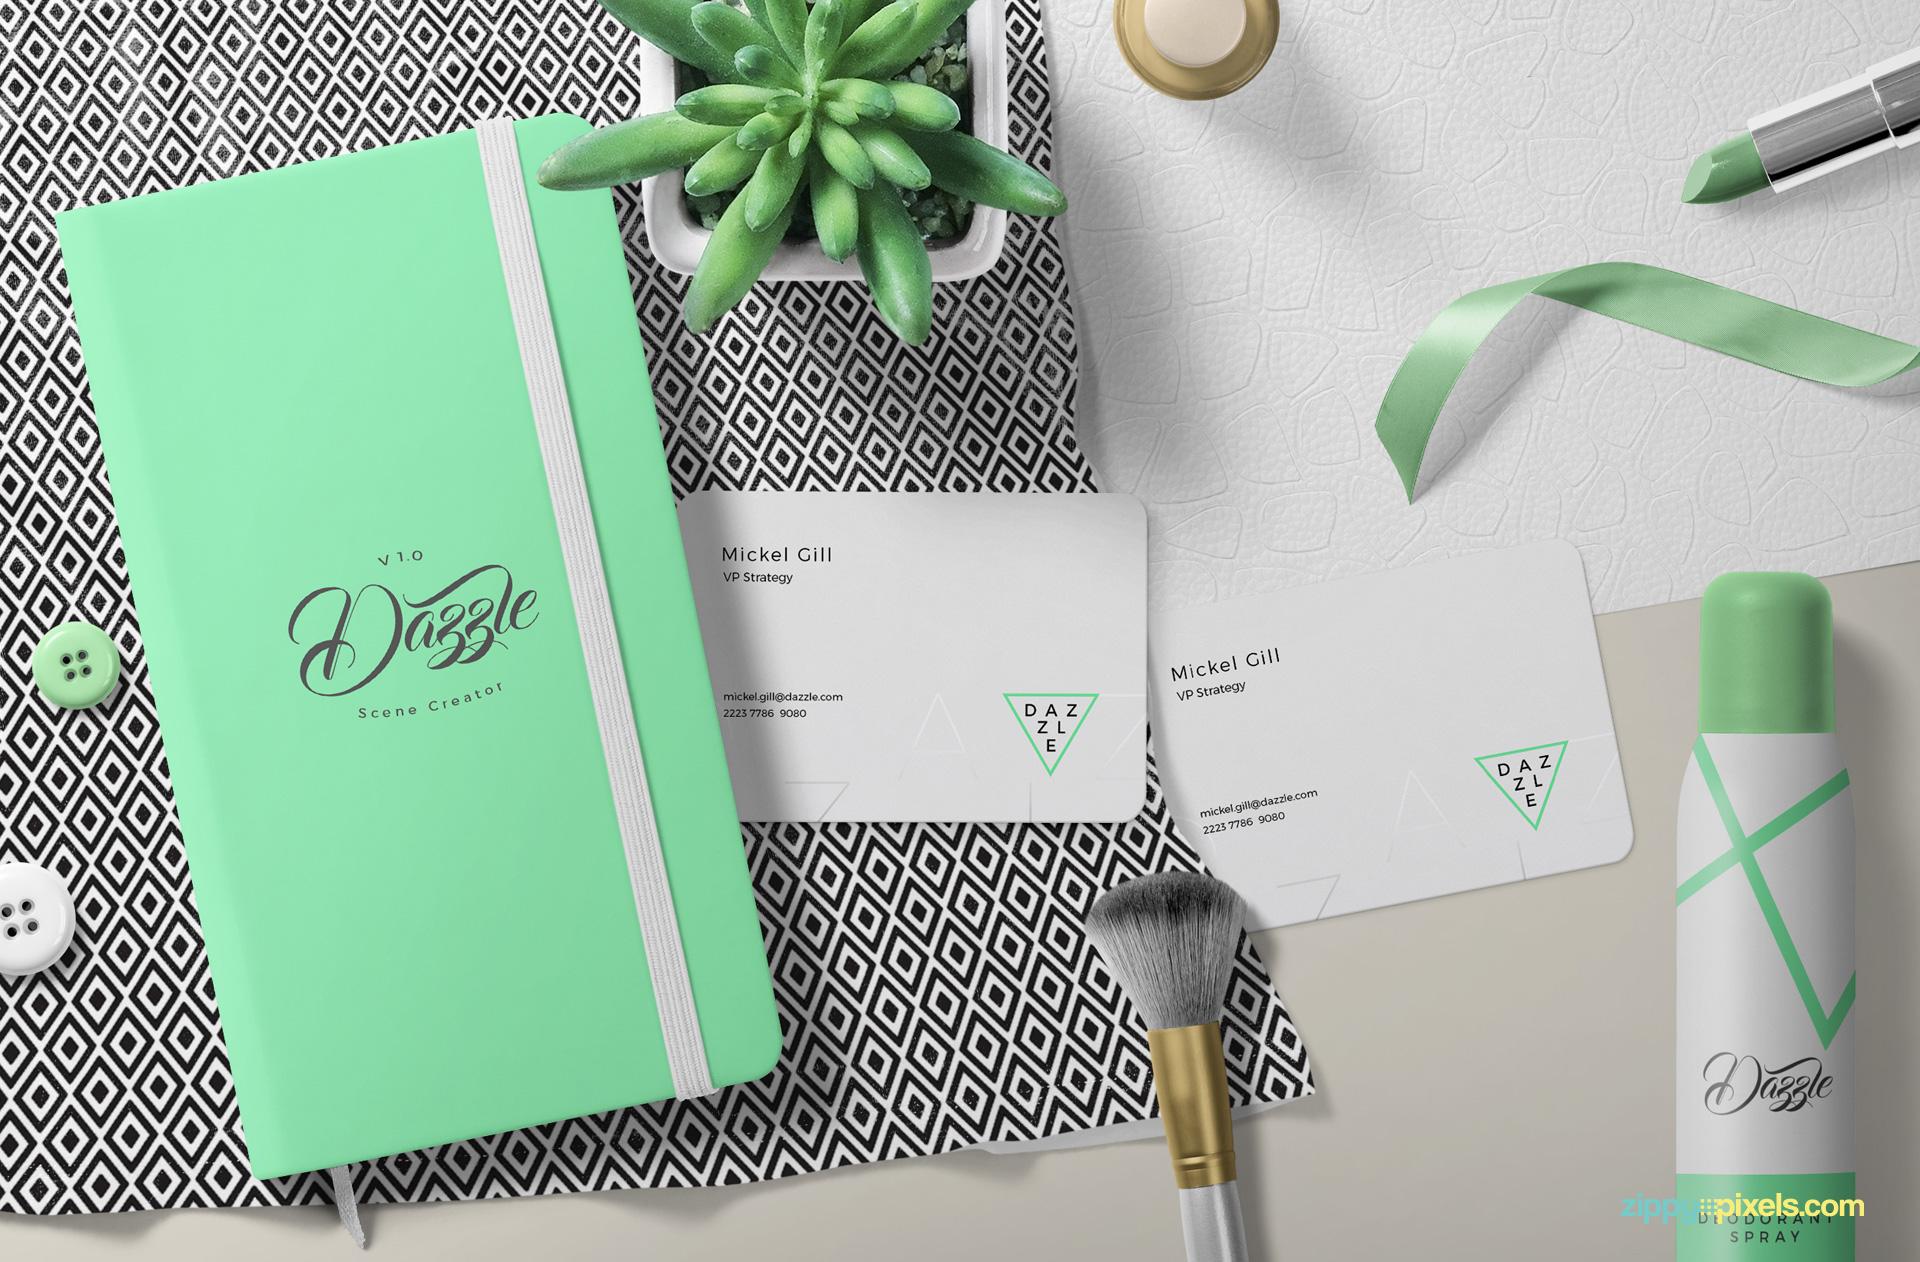 dazzle-scene-diary-planter-cards-shirt-tanktop-perfume-ribbon-lipstrick-nail-polish-02